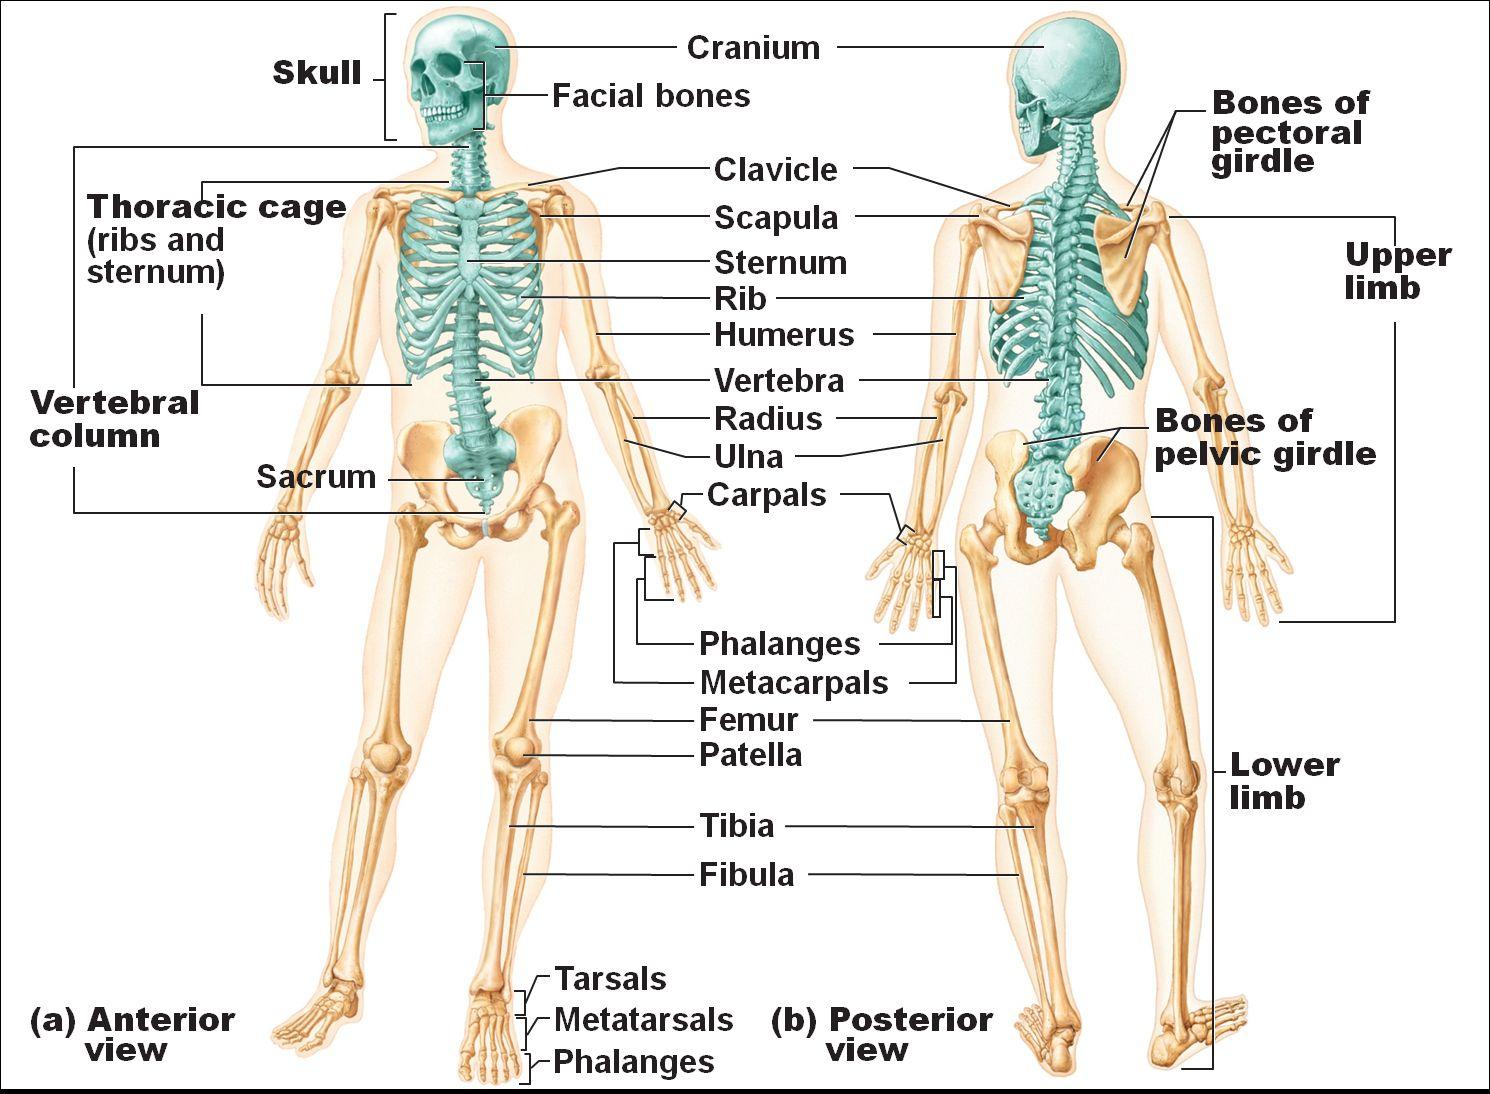 diagram of sternum diagram of sternum what part of the skeletal system includes the bones [ 1490 x 1094 Pixel ]